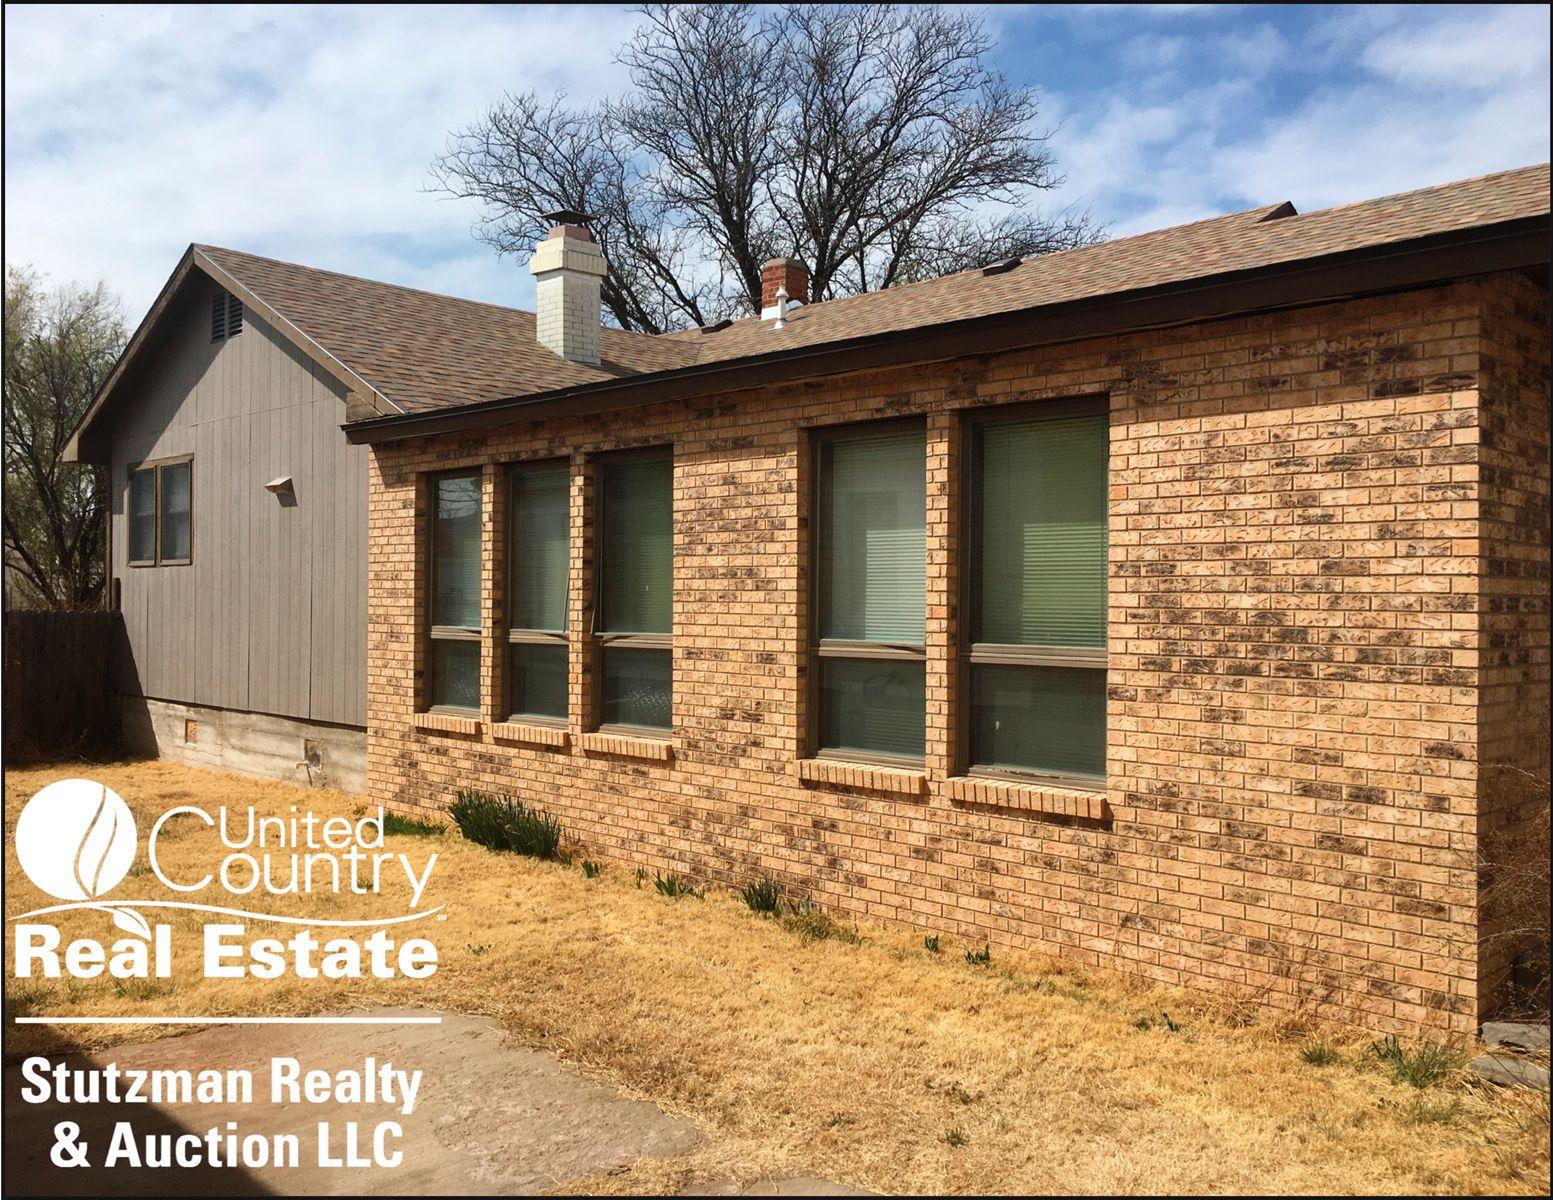 611 N Glenn St, Ulysses, KS 67880 - Estimate and Home Details   Trulia